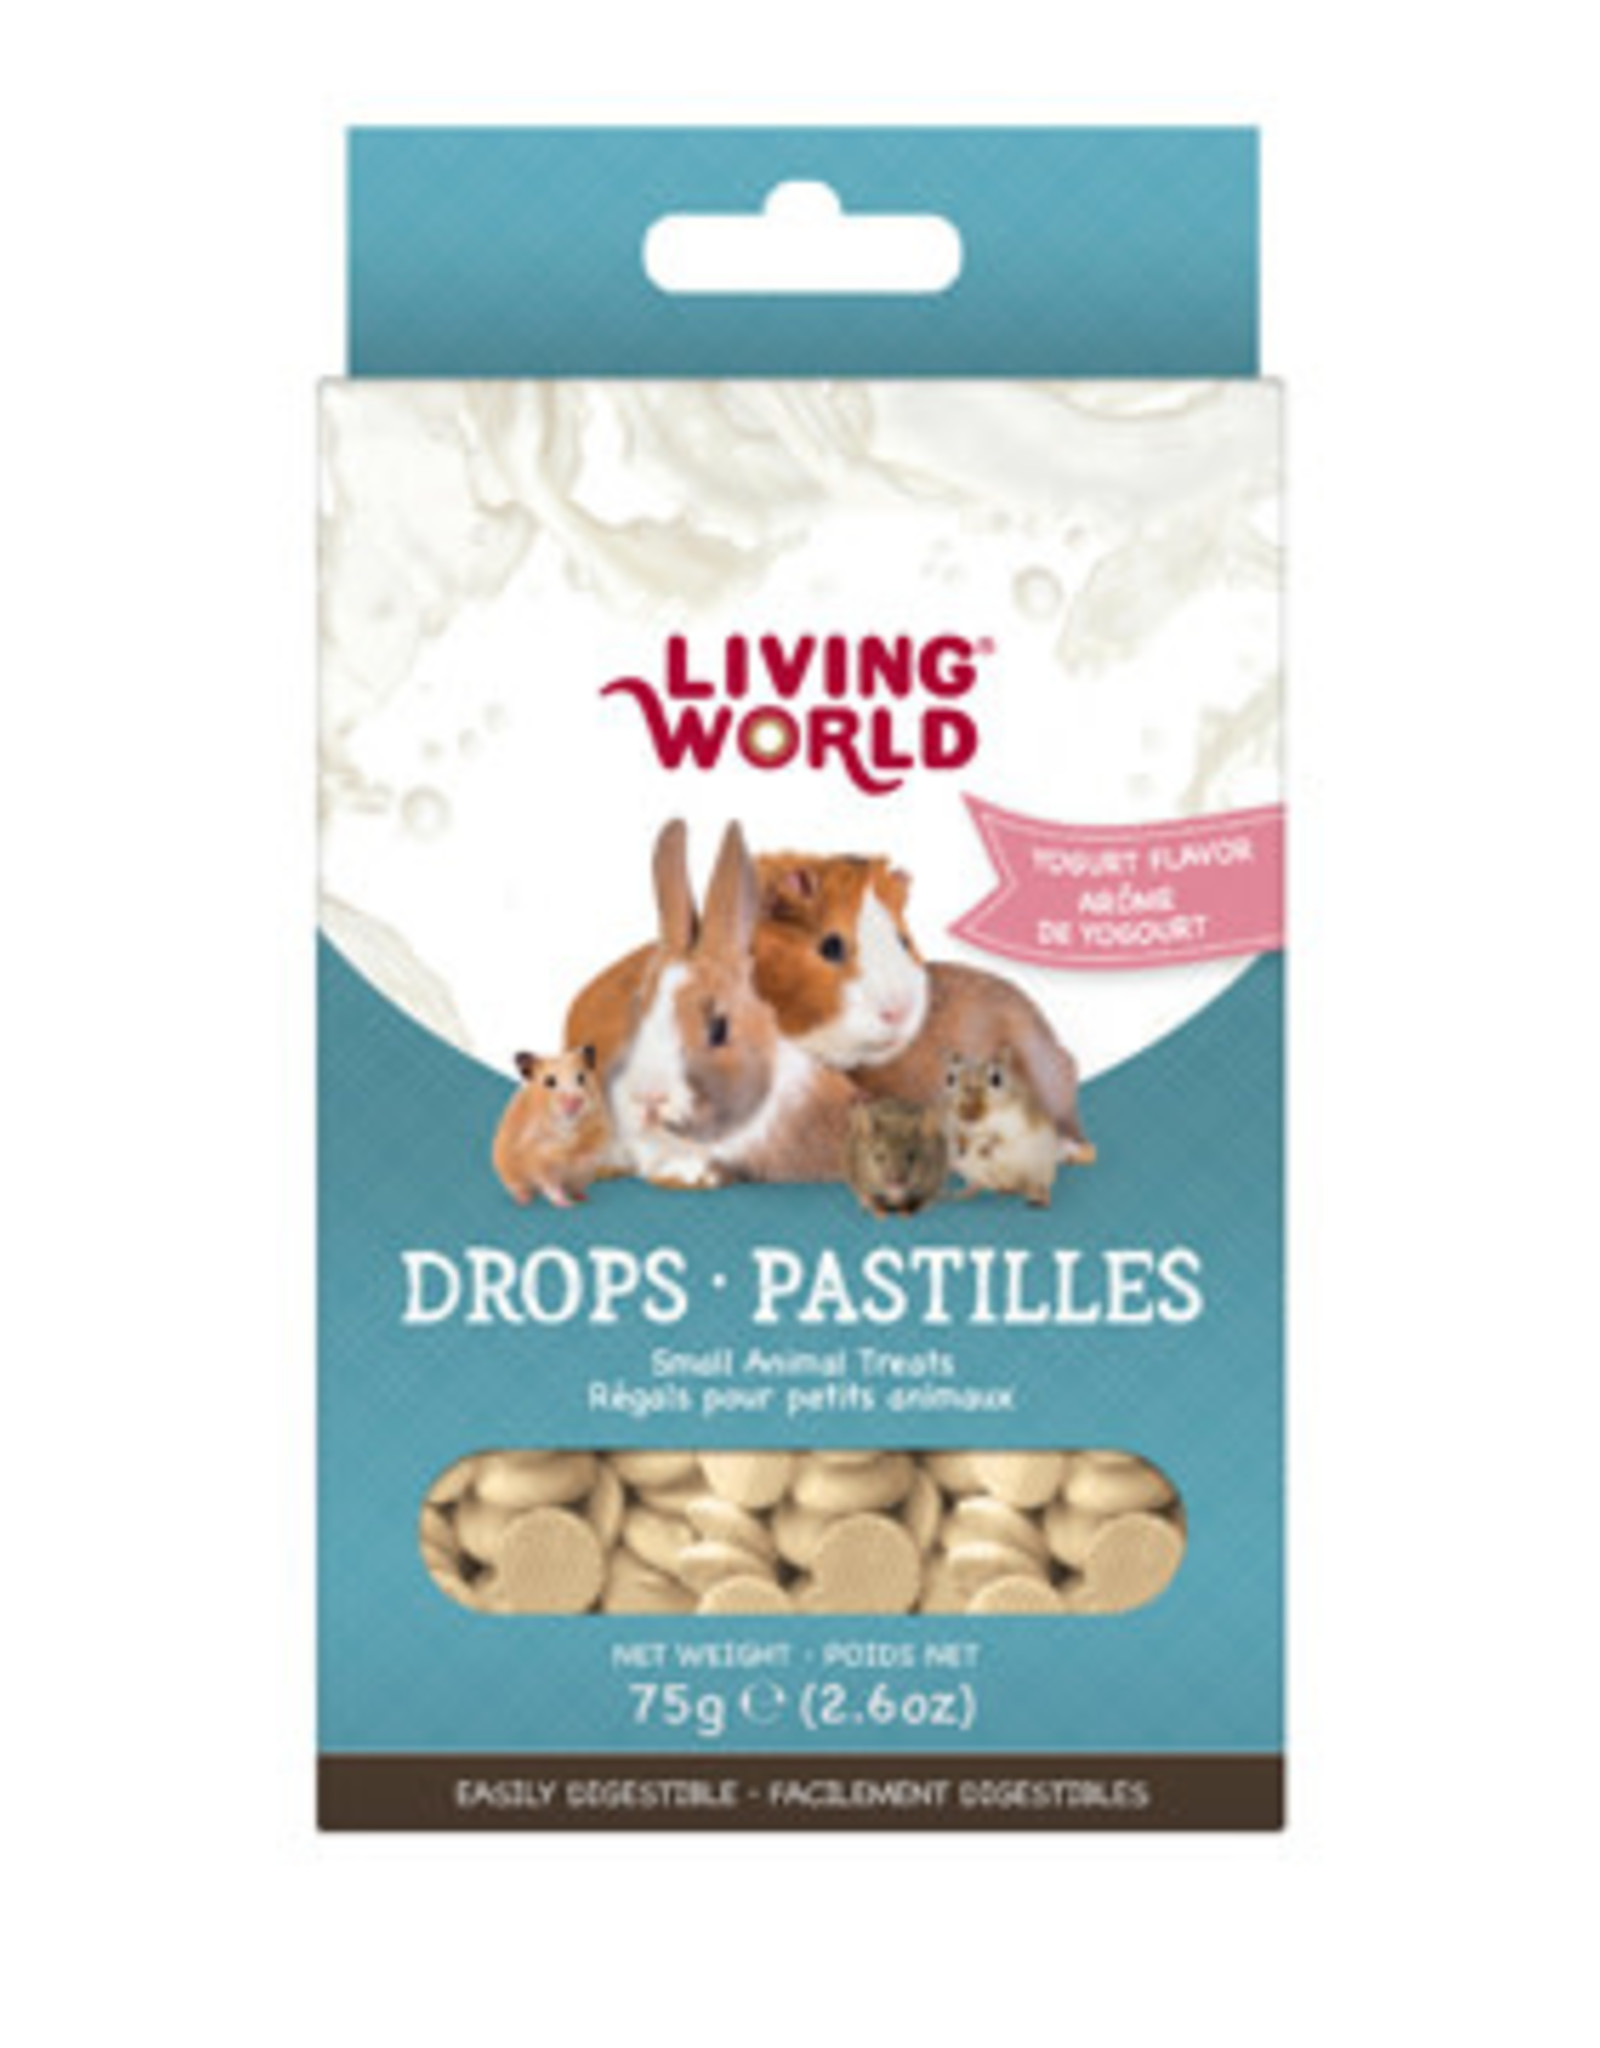 LIVING WORLD Living World Small Animal Drops - Yogurt Flavour - 75 g (2.6 oz)